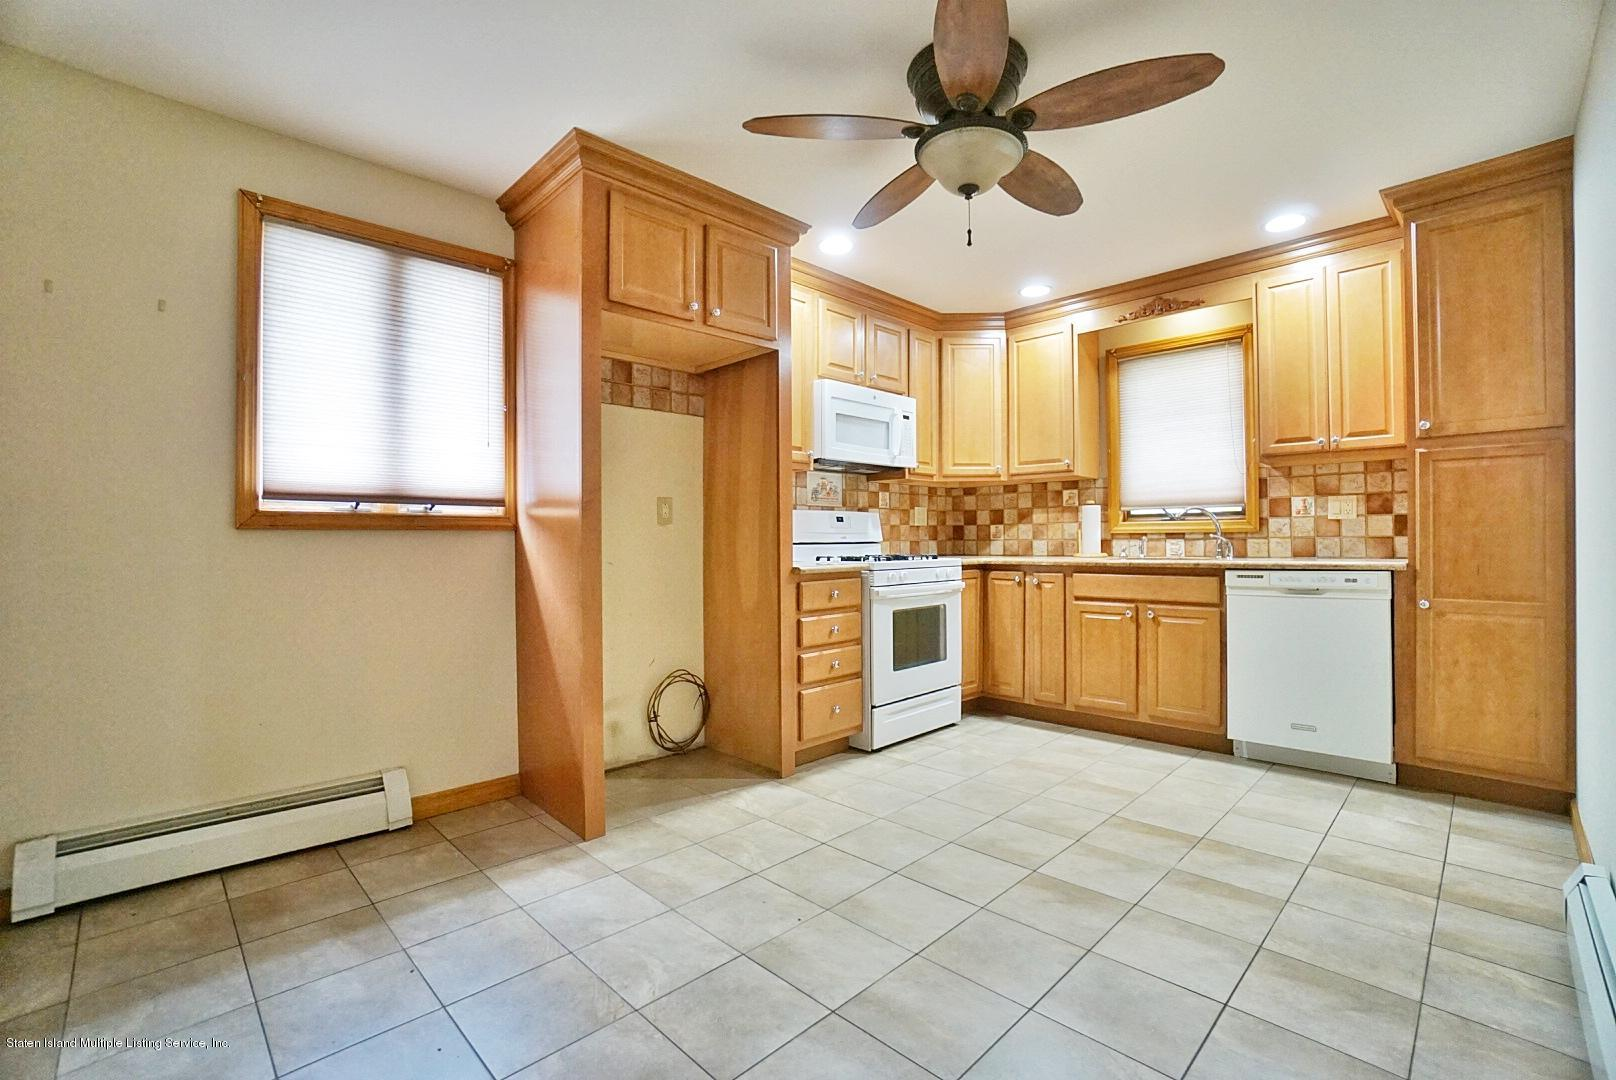 Single Family - Detached 55 Lyndale Avenue  Staten Island, NY 10312, MLS-1128769-3